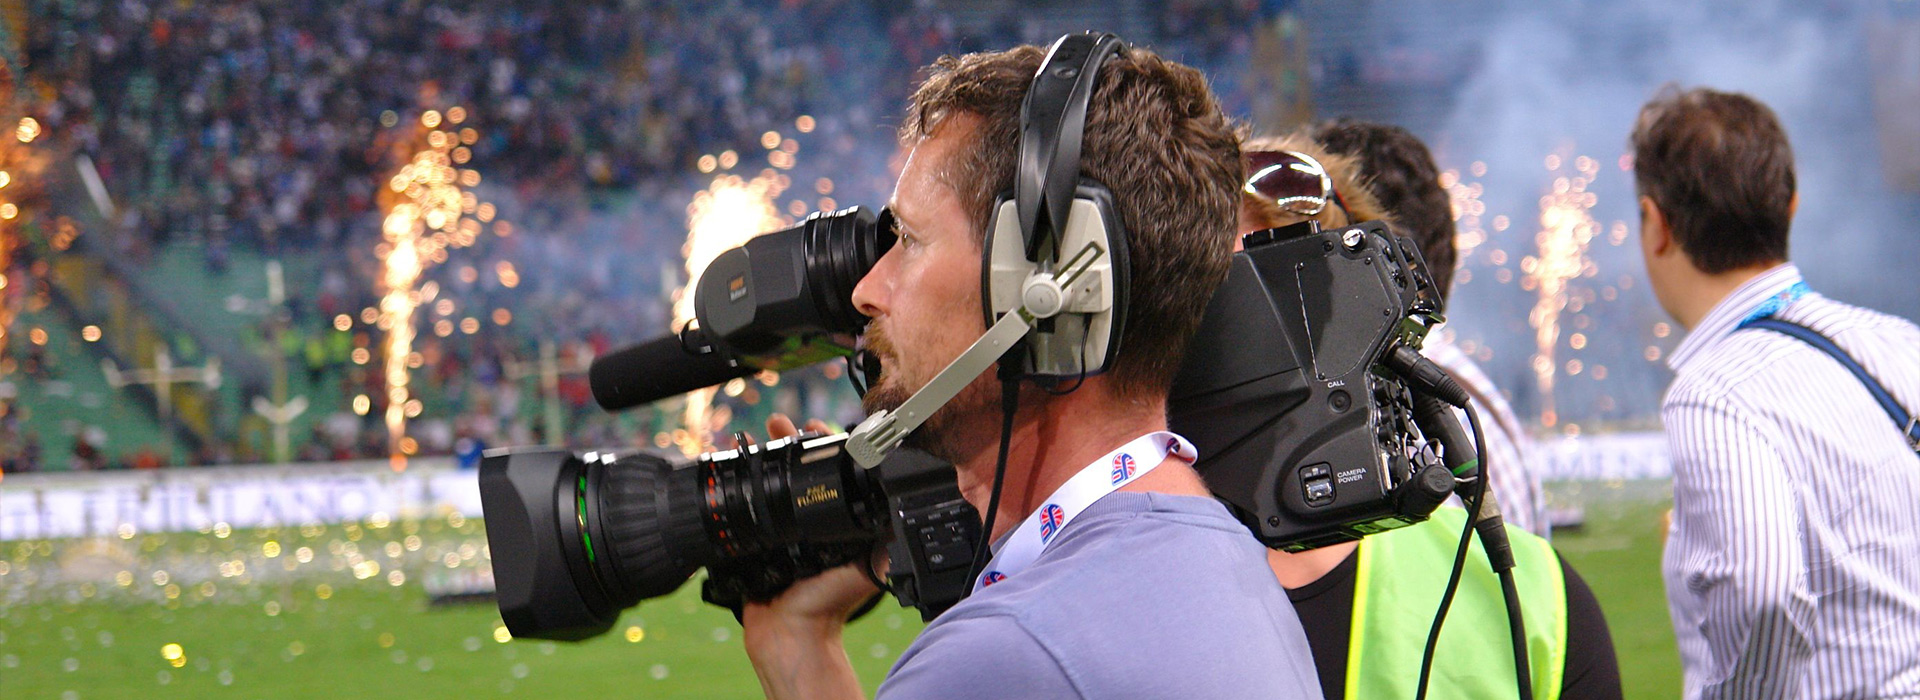 Riprese televisive in diretta di eventi sportivi